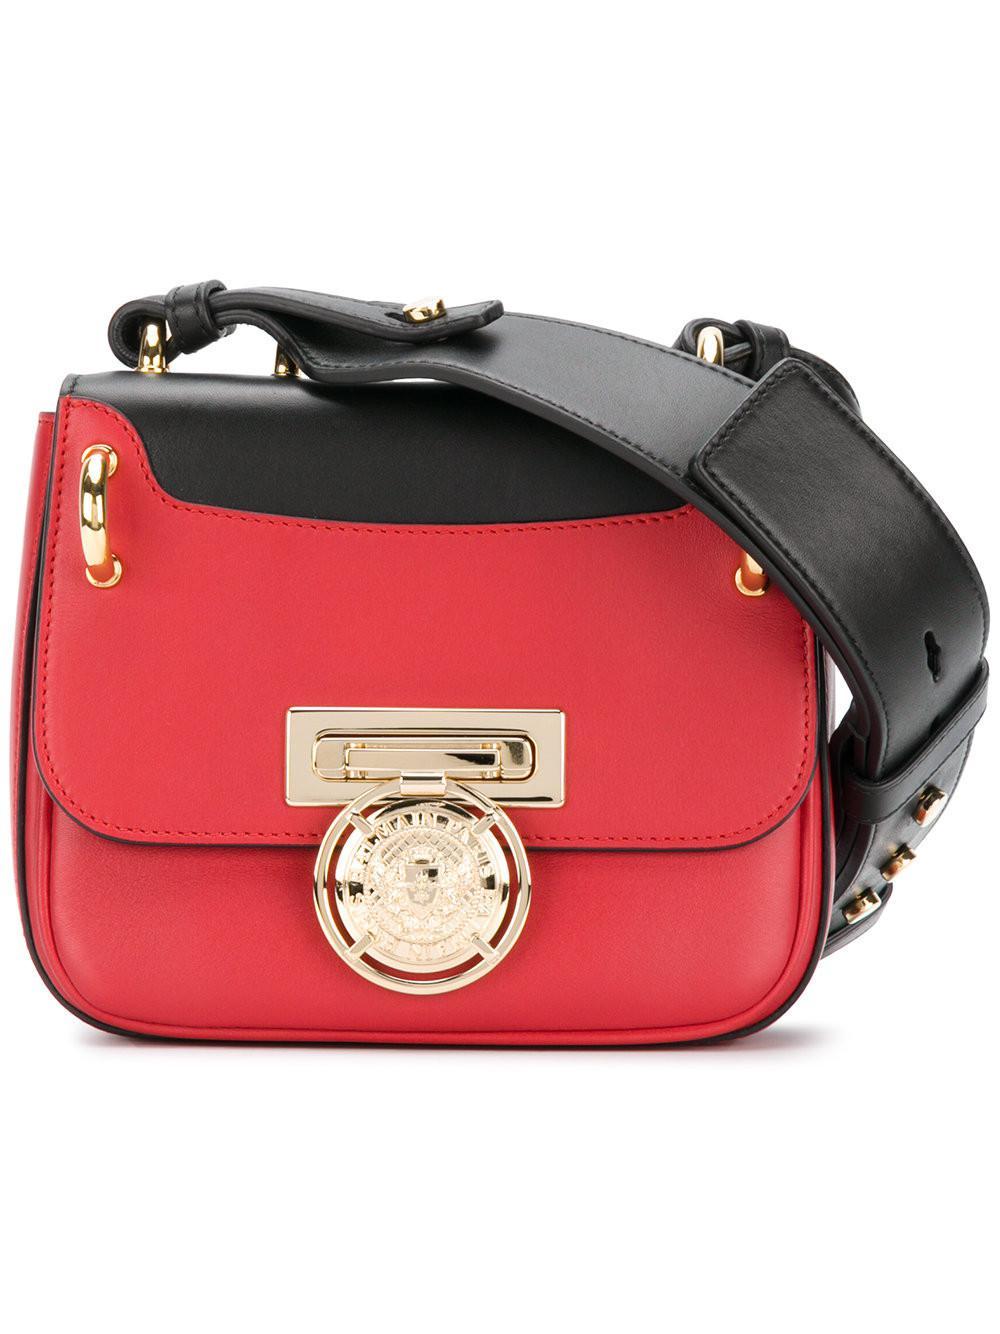 4e6f50381f Balmain Renaissance 18 Shoulder Bag in Red - Lyst